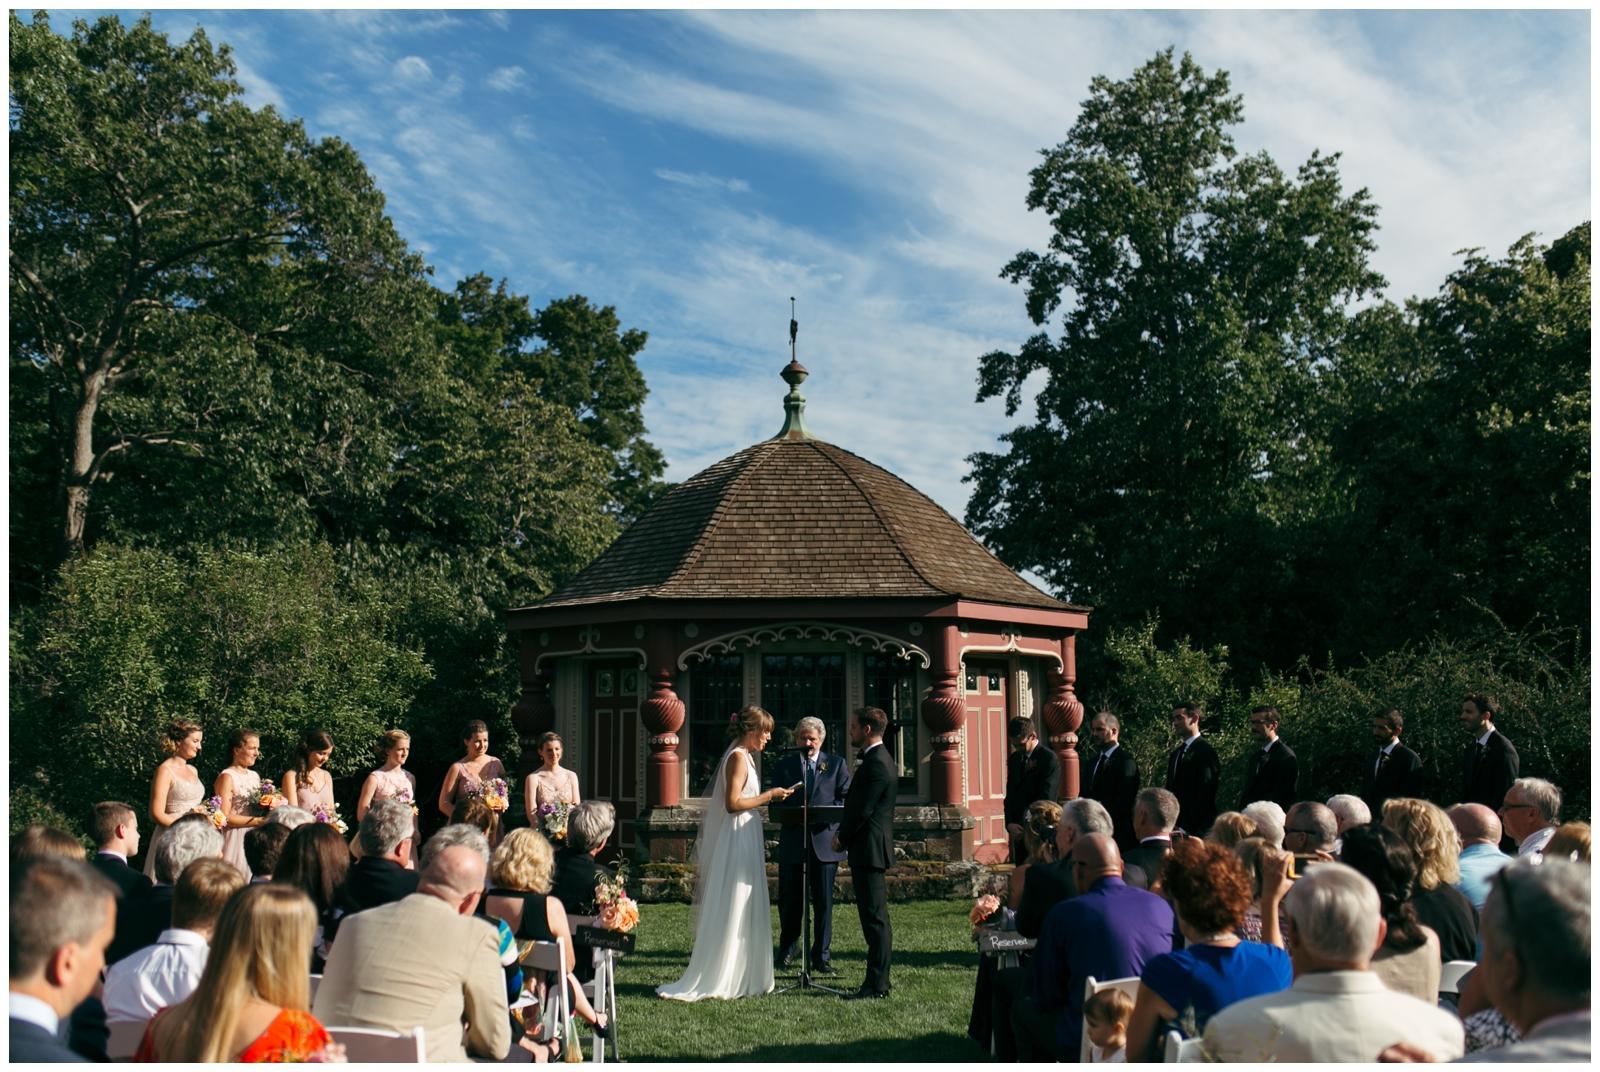 Moraine-Farm-wedding-Bailey-Q-Photo-Massachusetts-wedding-photpgrapher-074.jpg